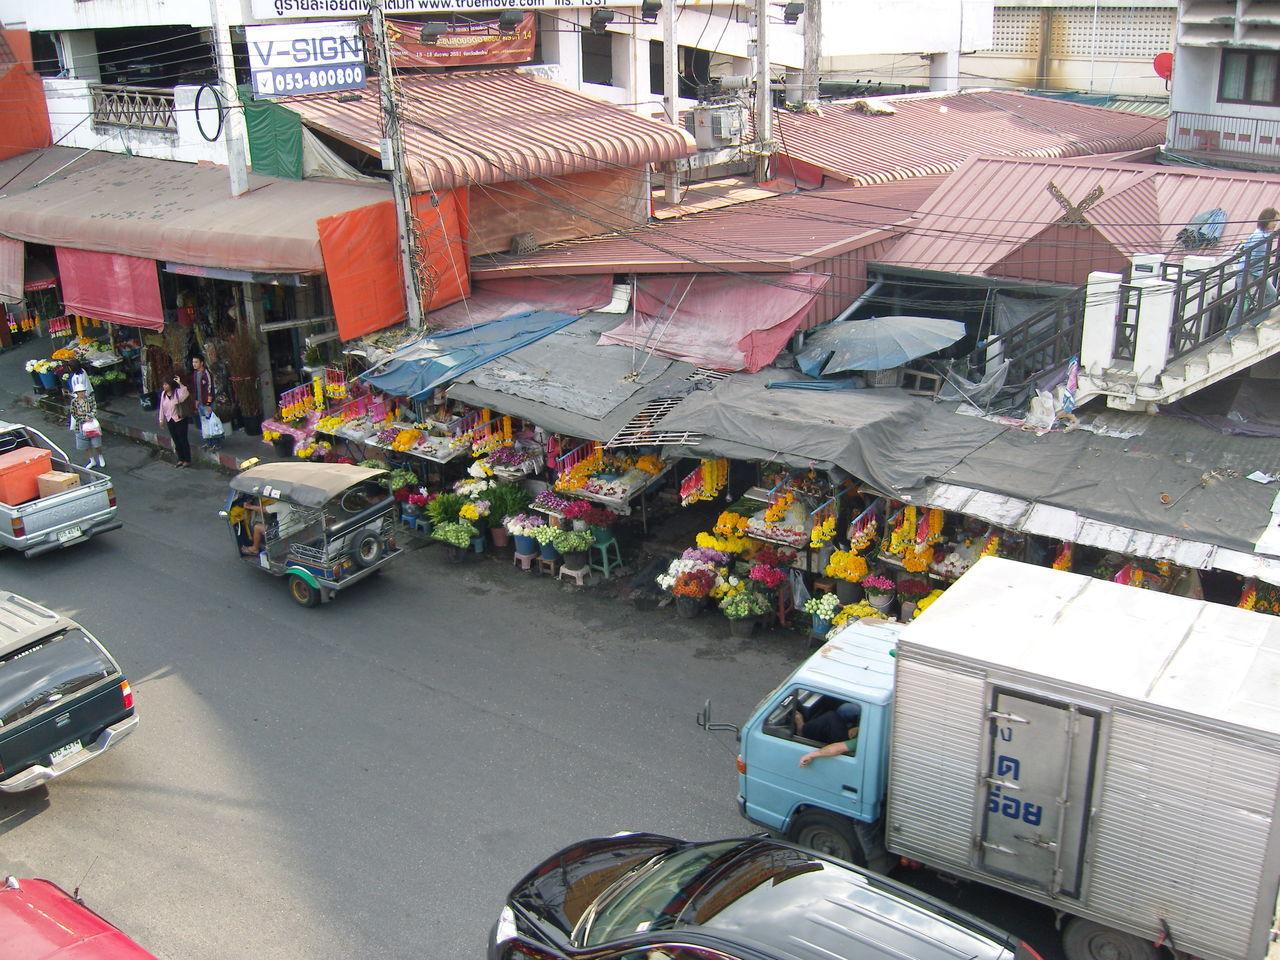 High Angle Thai Street High Angle View Street From Above Street Scene From Above Thai Roof Thai Street Market Thailand From Above Thailand Street Tuc Tuc